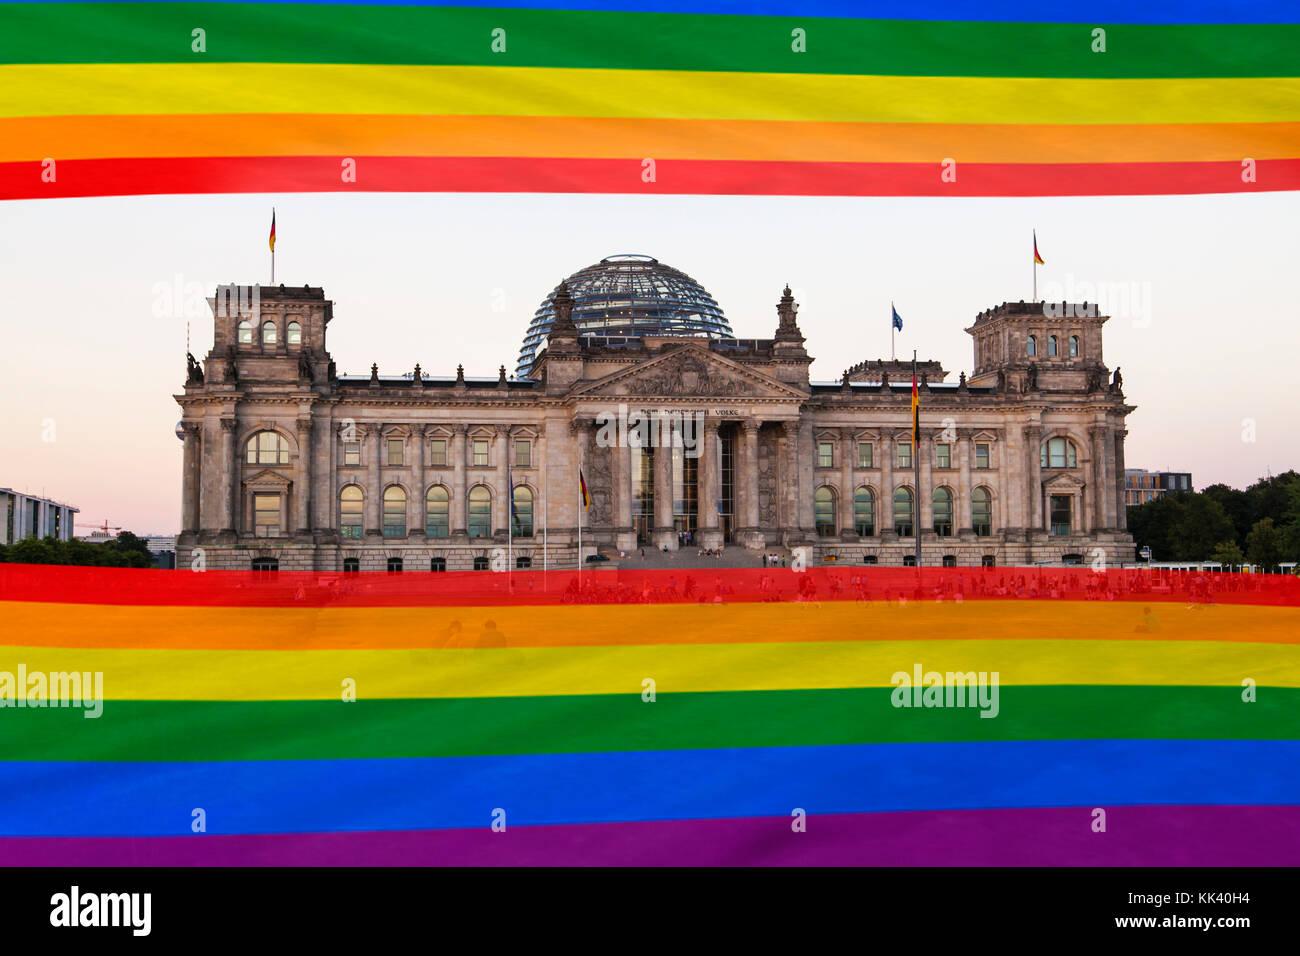 German parliament - Stock Image